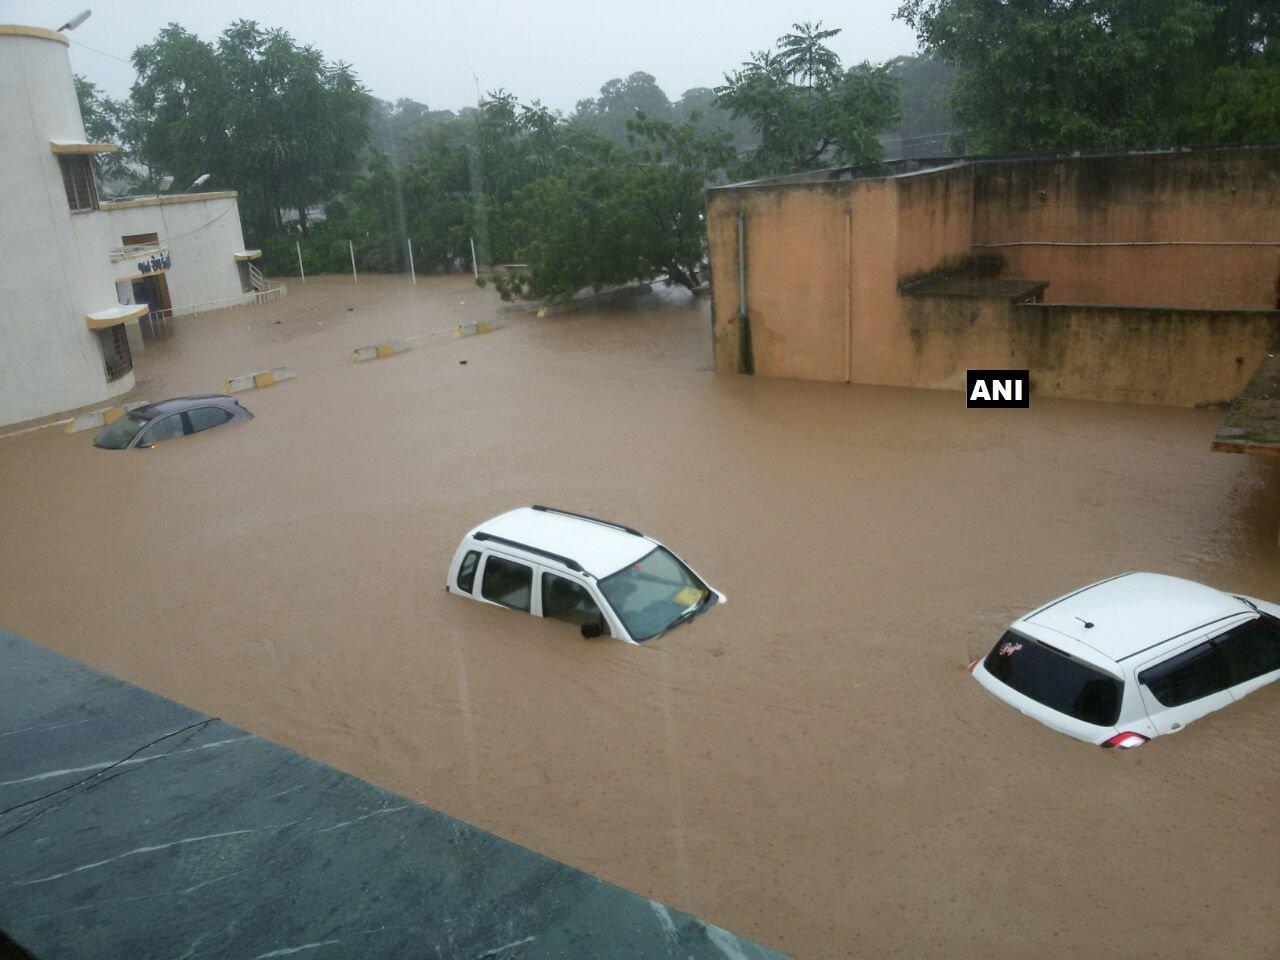 Some villages still water logged in Banaskantha two months after flood, 150 pumps on task